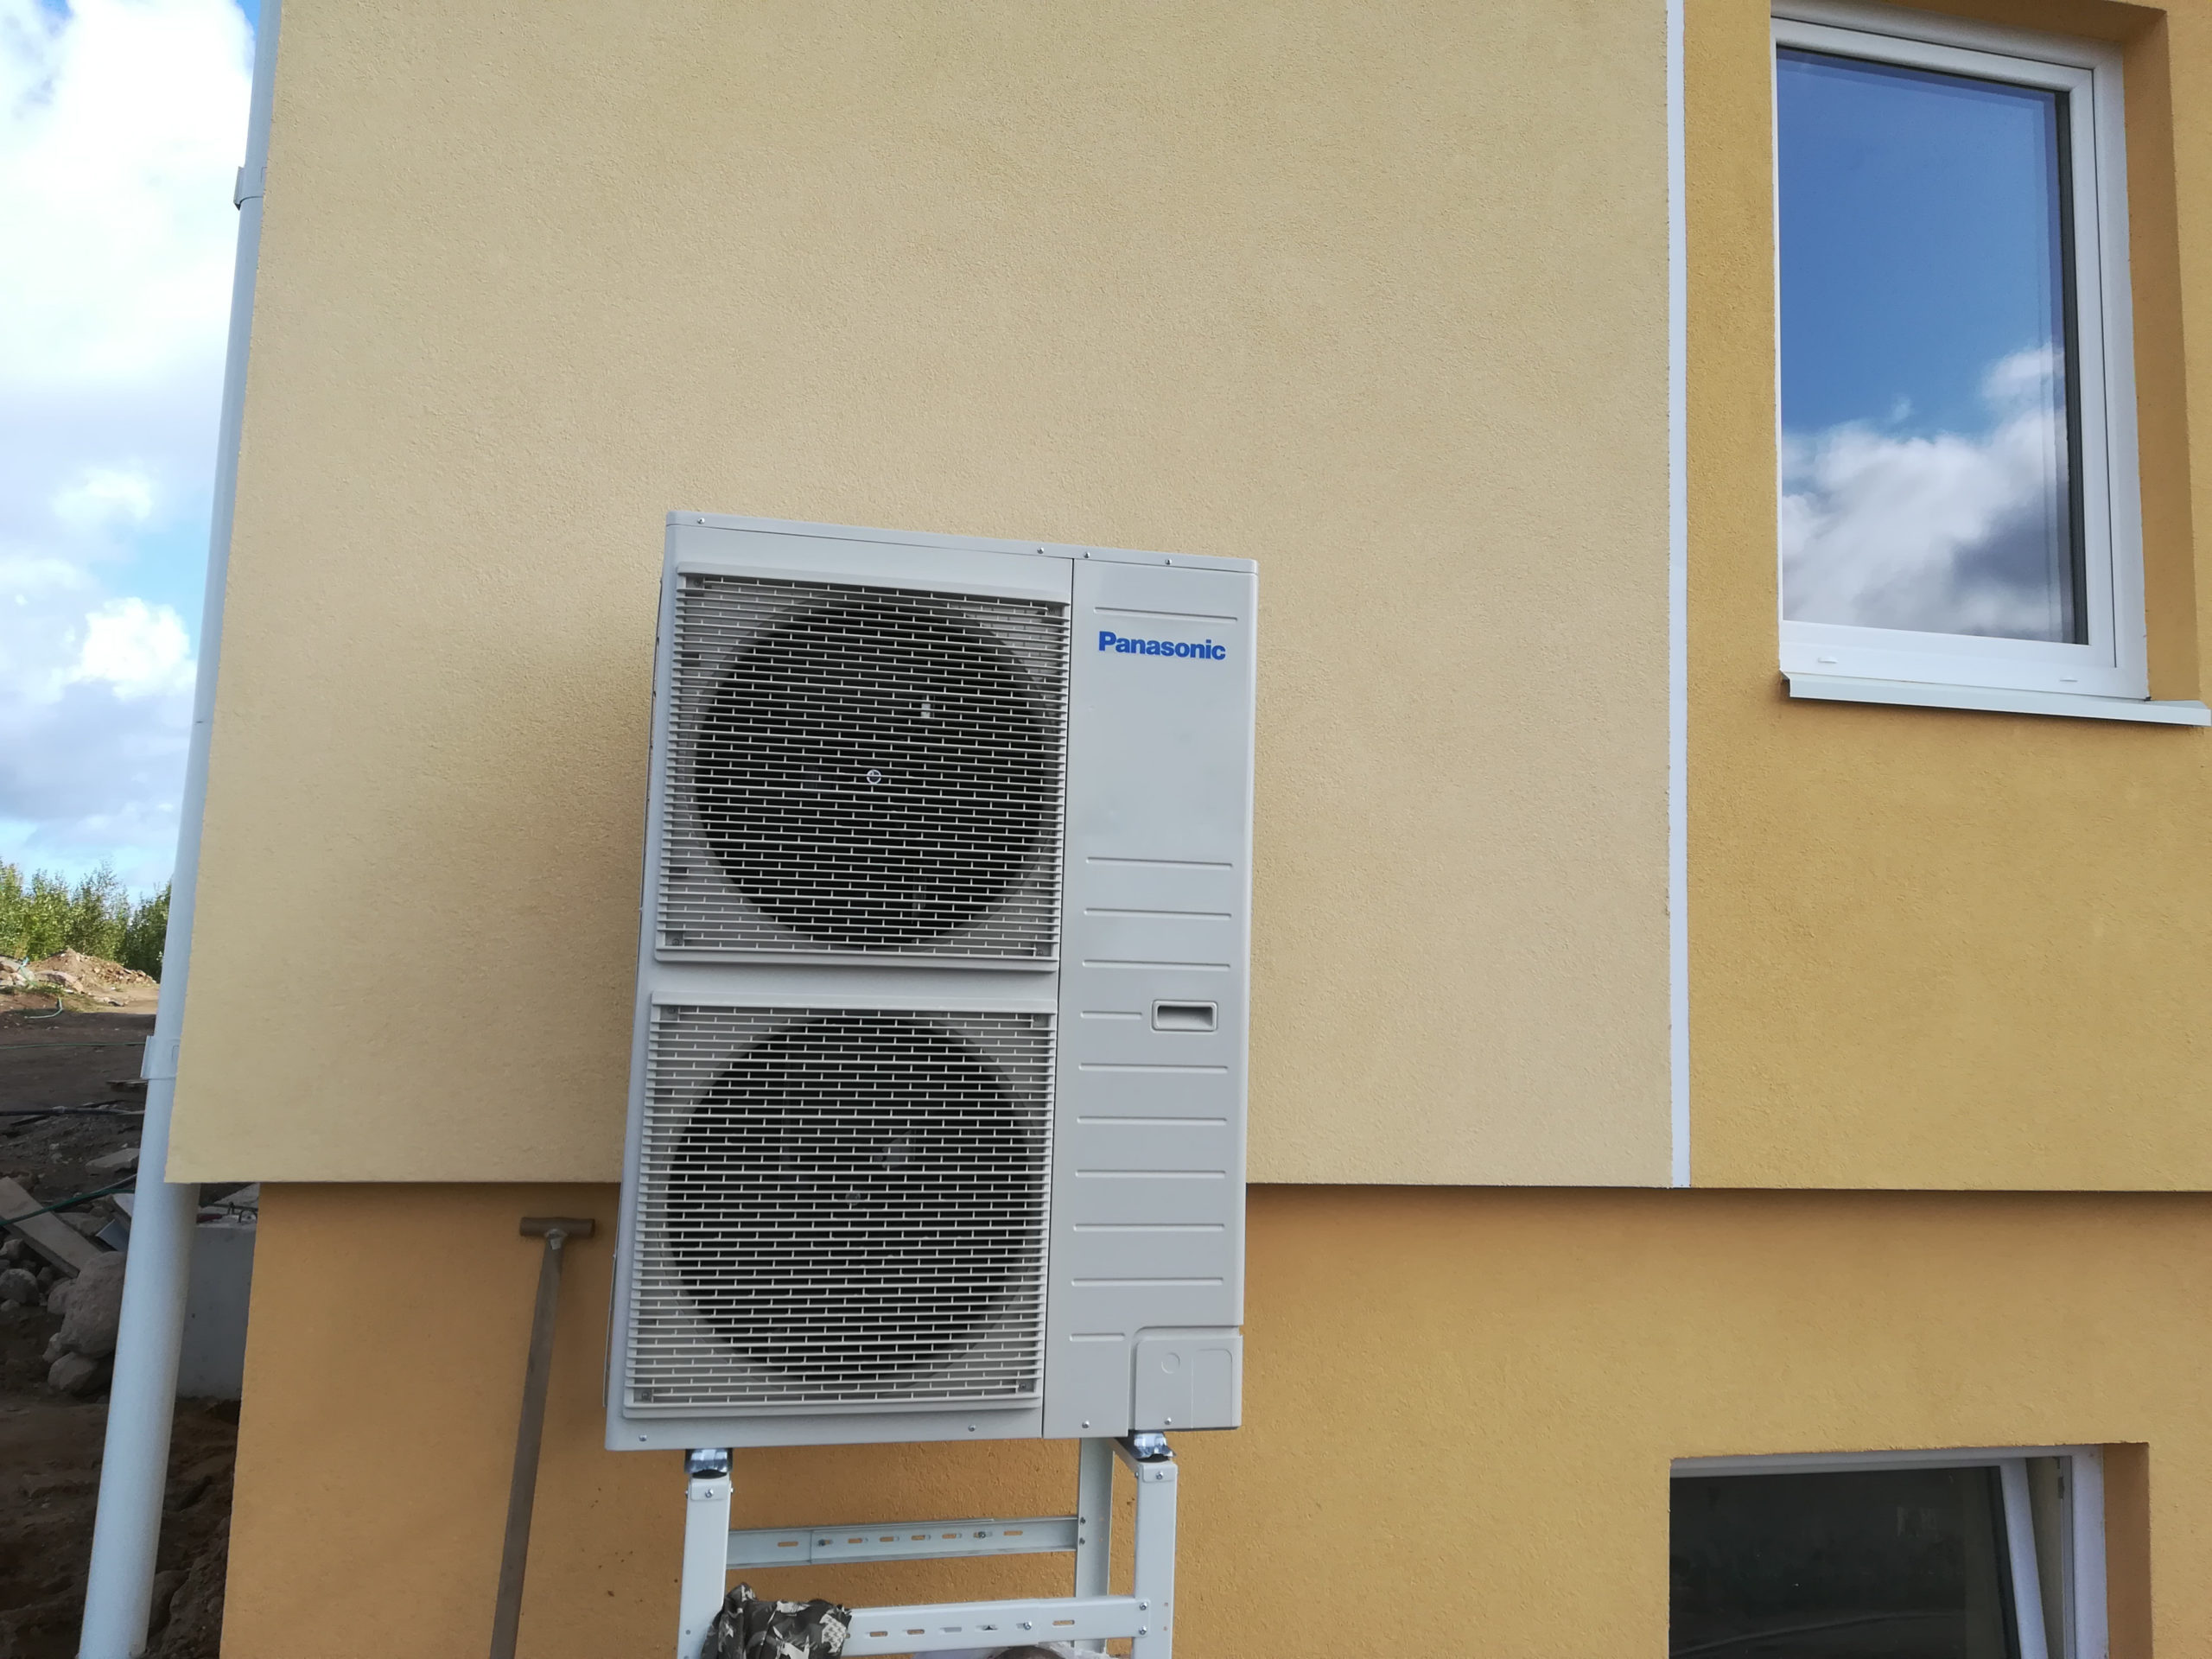 Panasonic Oras Vanduo9